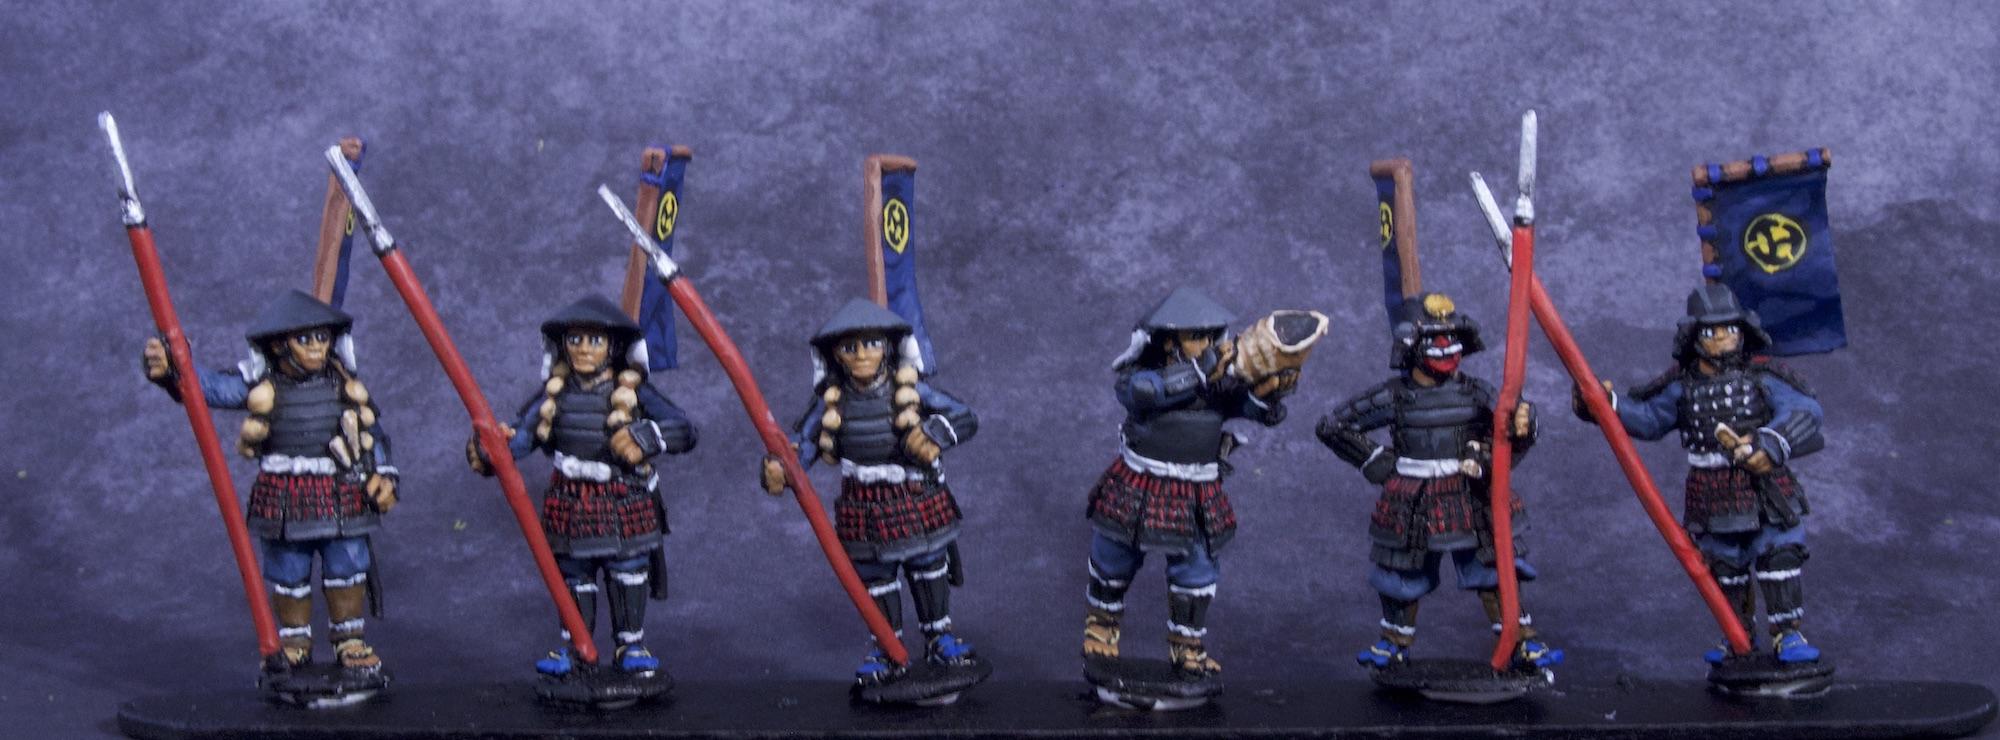 Painted Samurai and Ashigaru Miniatures